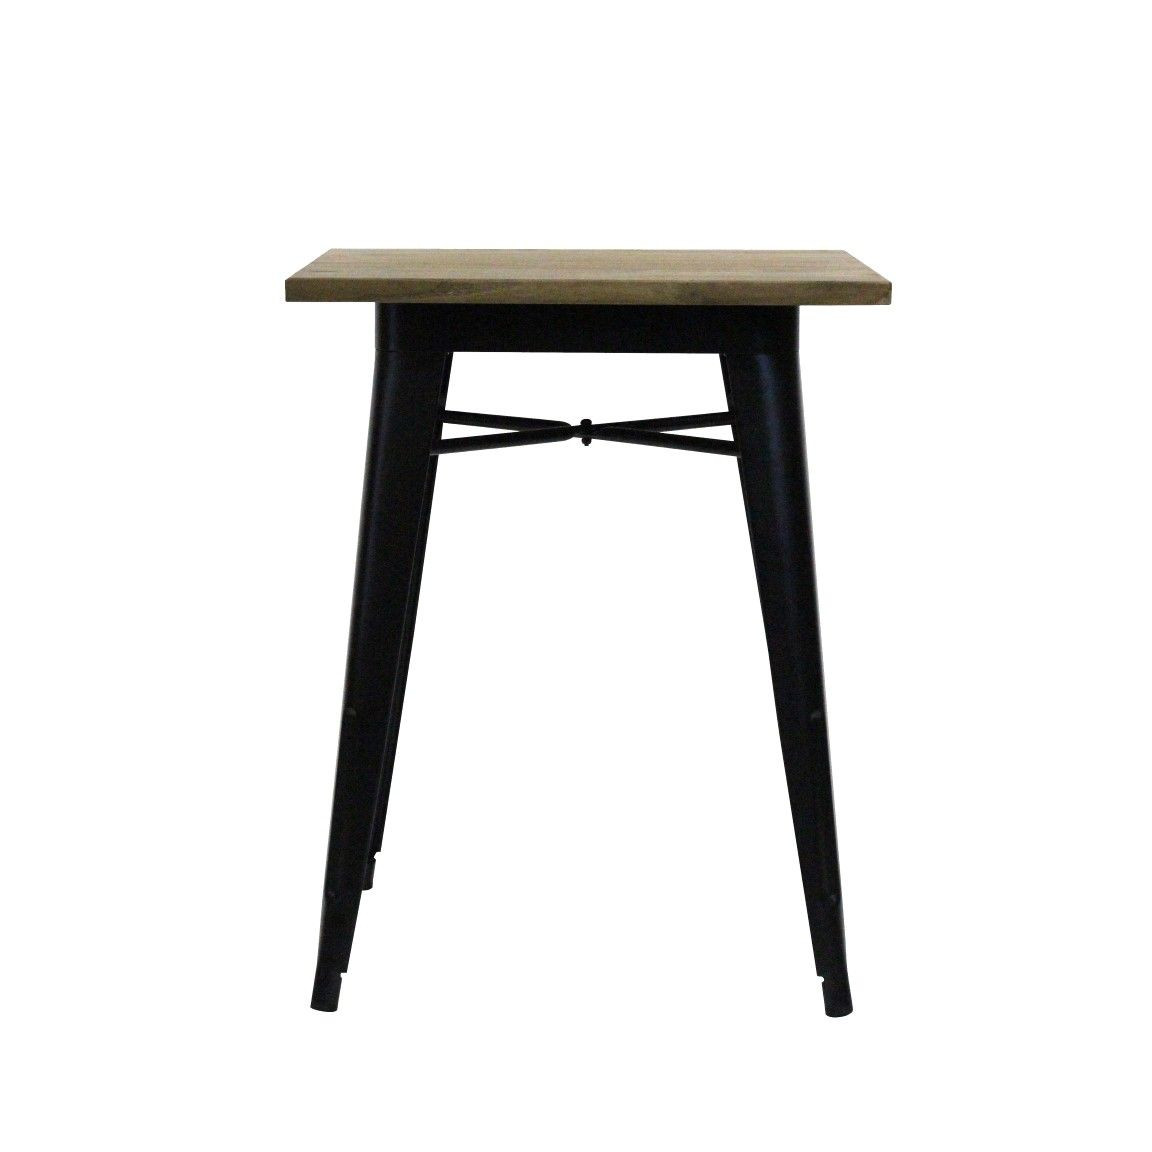 Tisch | Metall & Rüsterholz